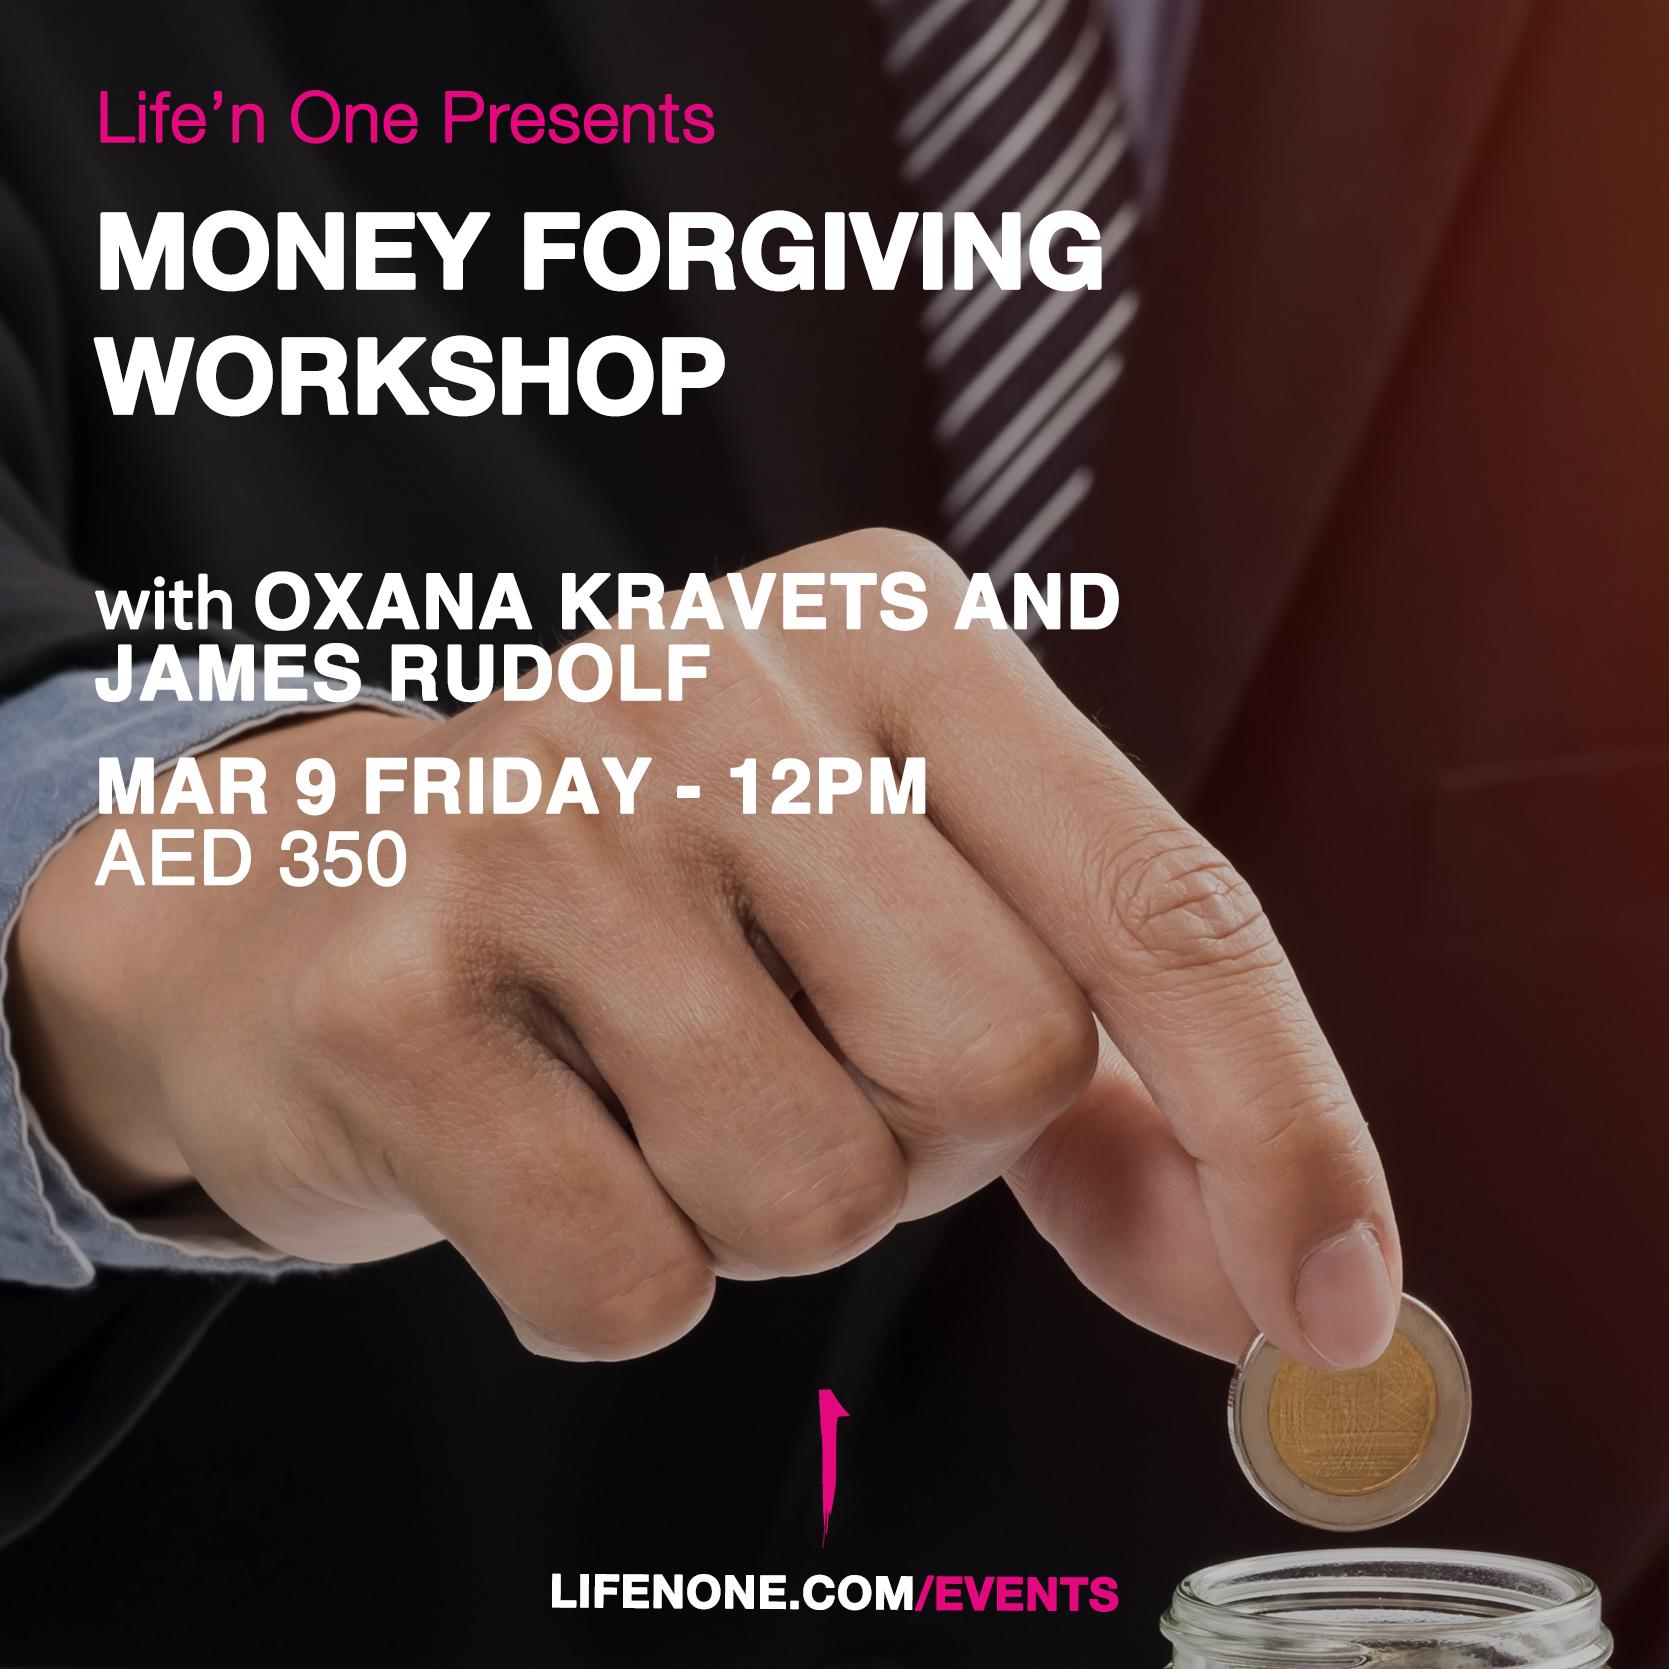 Money Forgiving Workshop with Oxana Kravets and James Rudolf